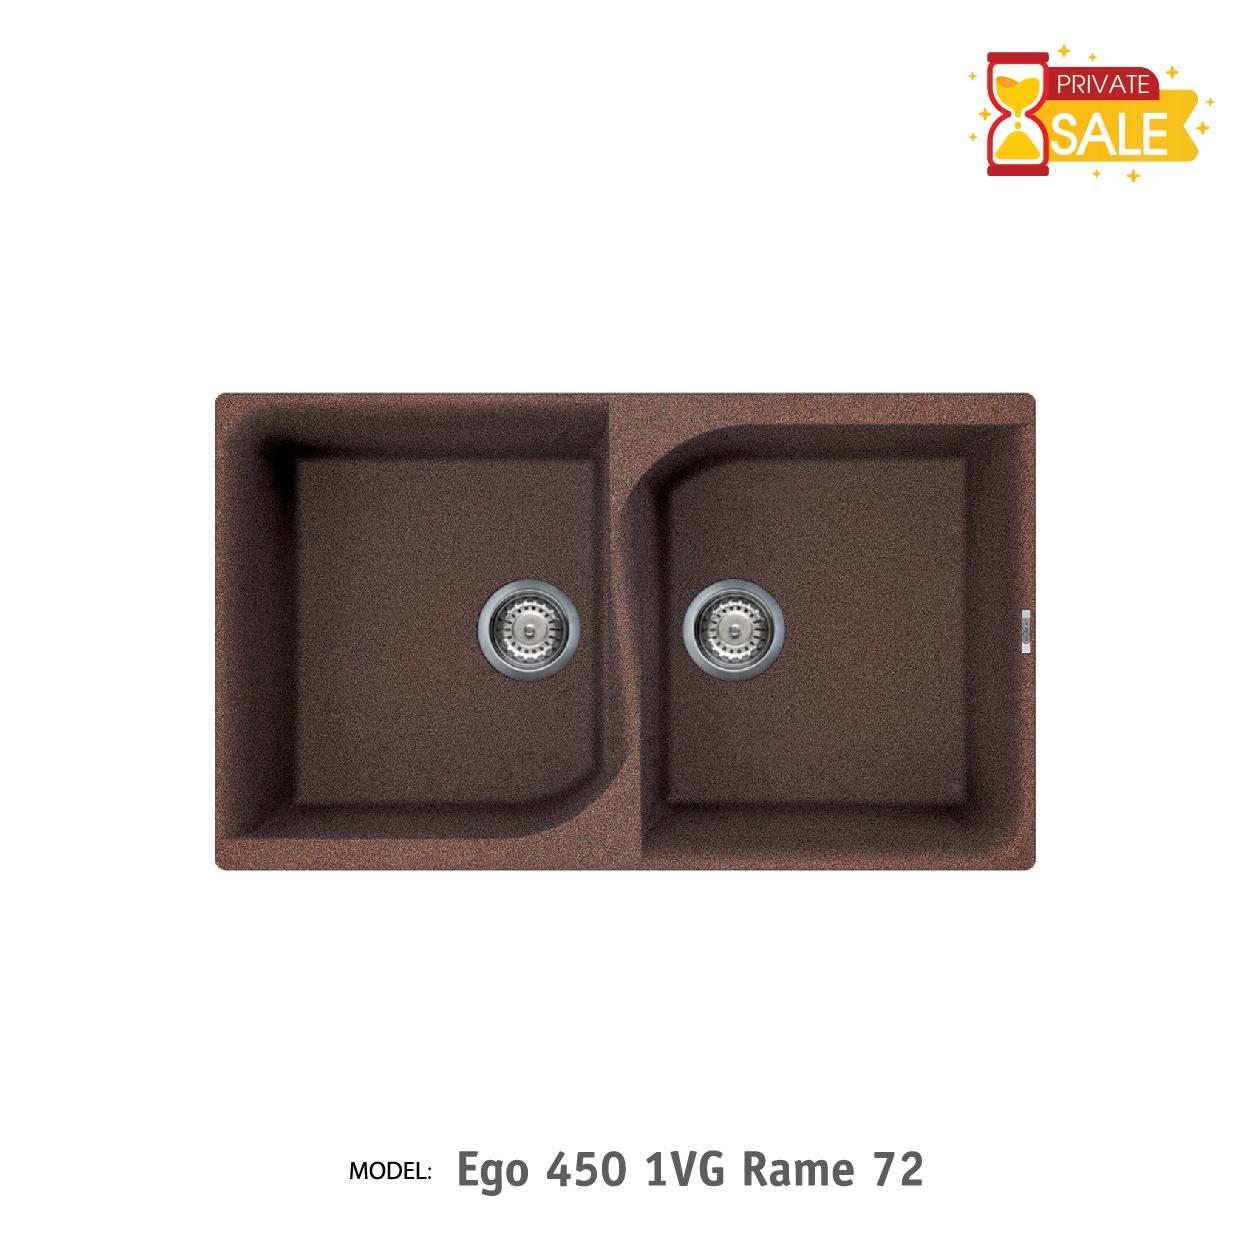 Chậu đá Elleci - Model Ego 4501VG Rame72